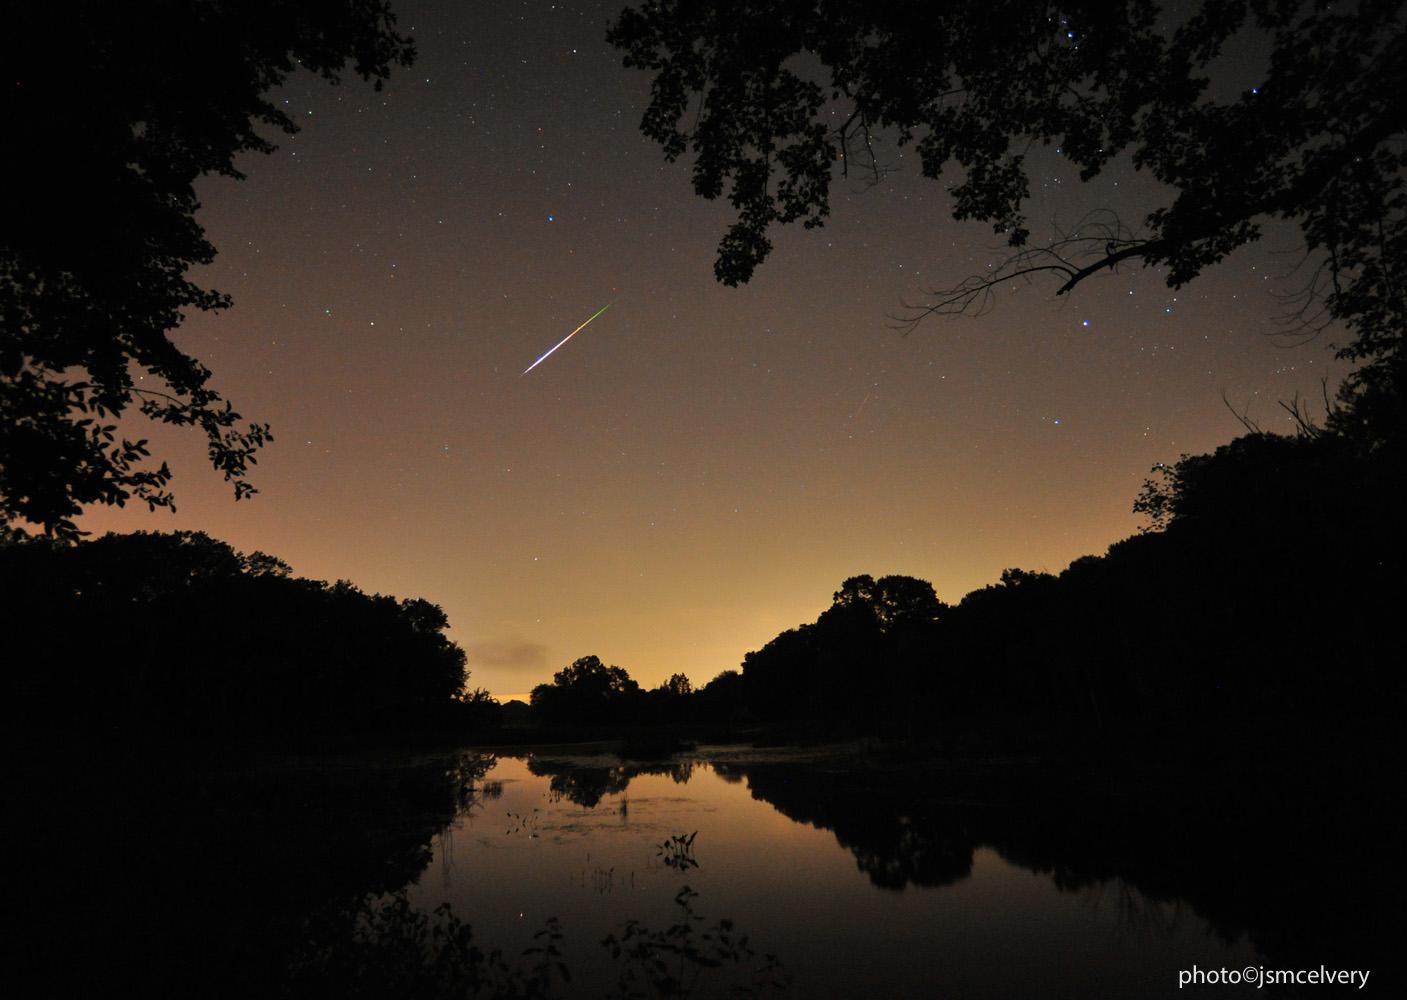 Perseid Meteor Shower 2013: Jonathan S. McElvery